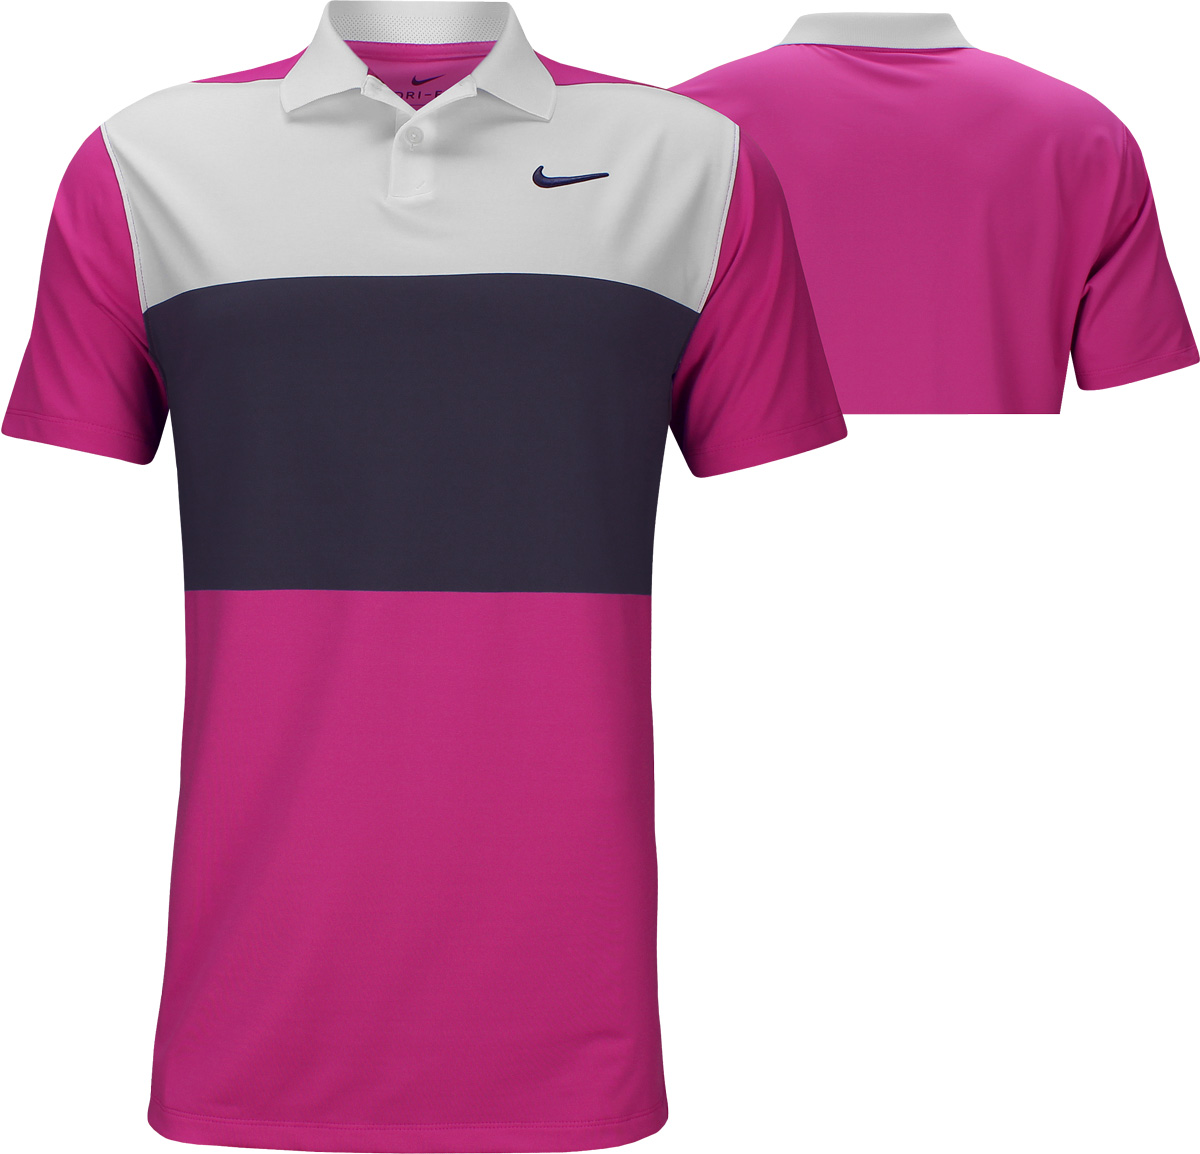 f865f0289bc3 Nike Dri-FIT Vapor Control Color Block Golf Shirts - Active Fuchsia